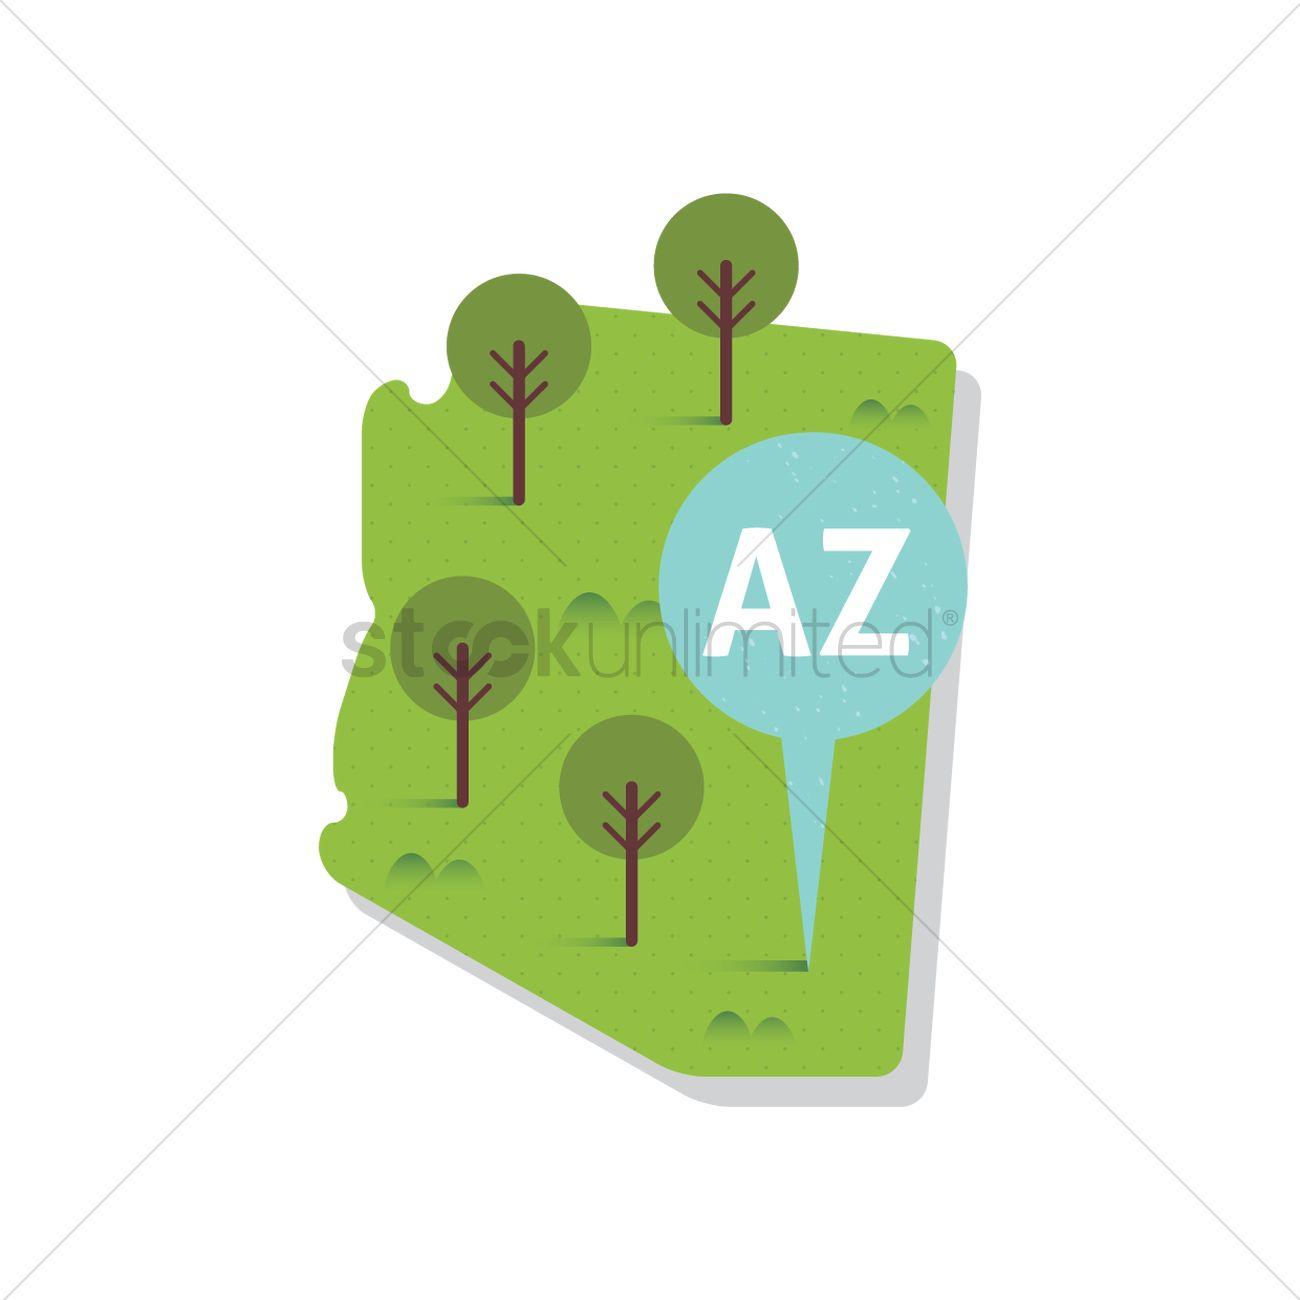 Arizona State Map Free.Free Arizona State Map Vector Image 1557055 Stockunlimited